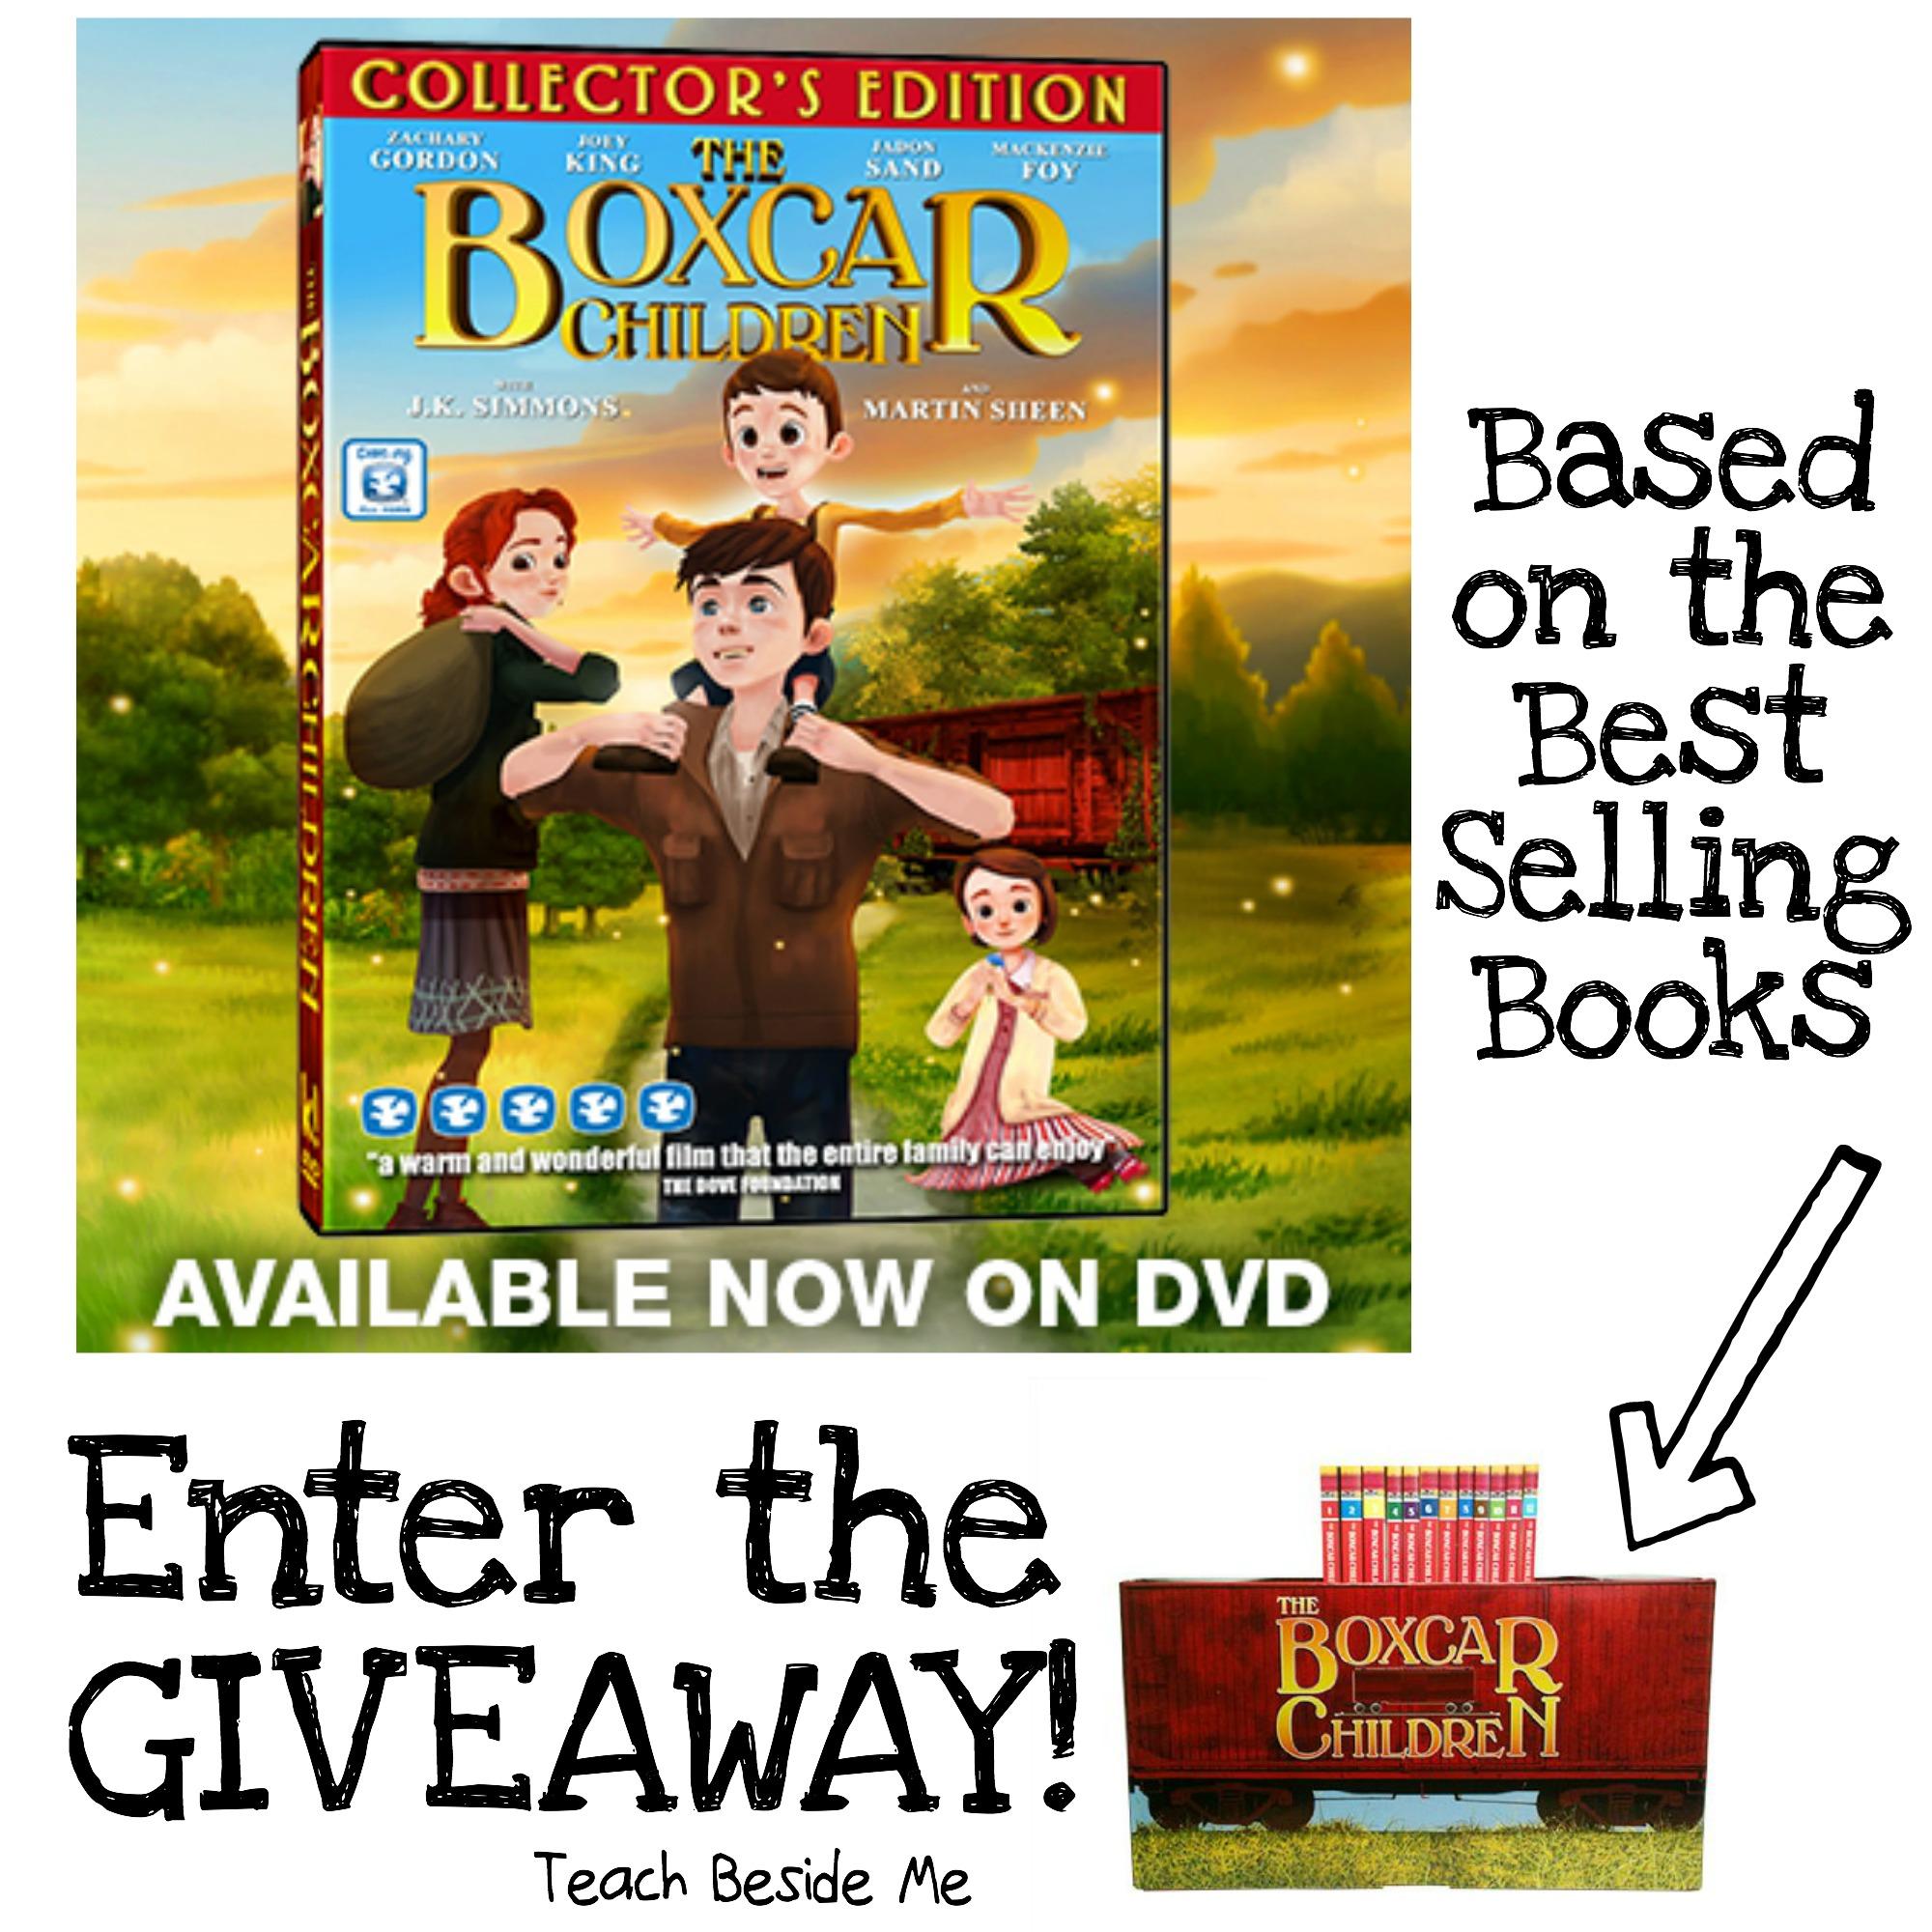 Boxcar Children DVD